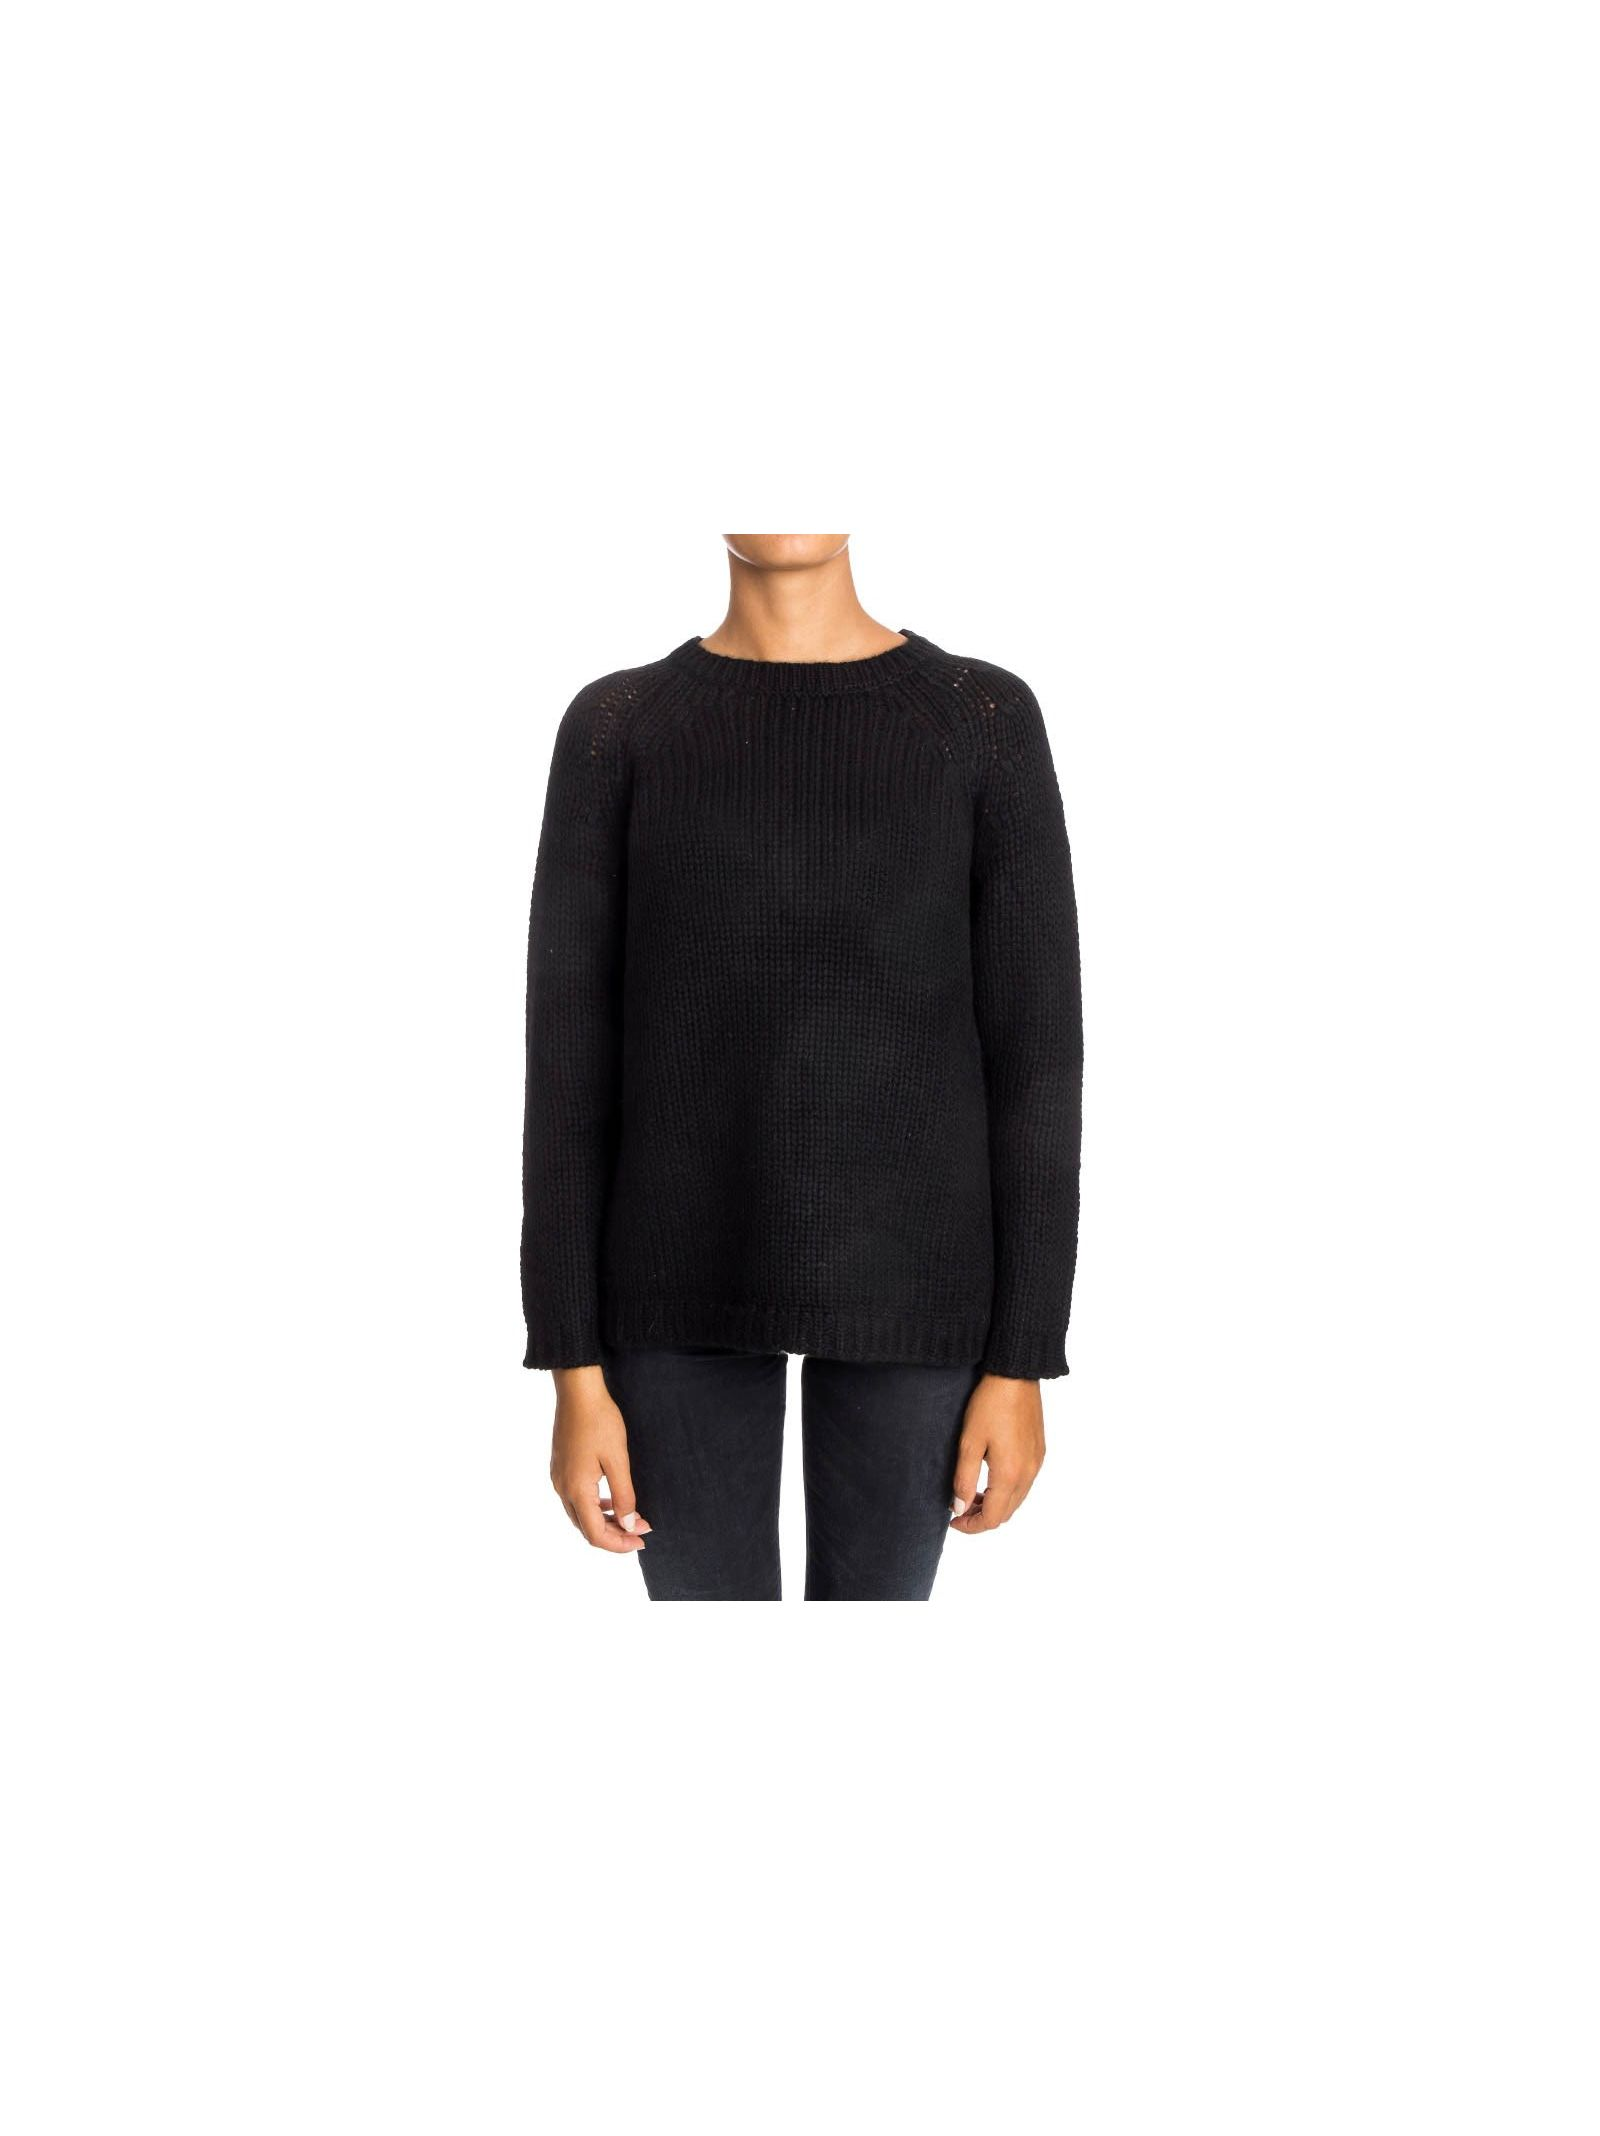 360 Cashmire - Cachemire Sweater - Steffy